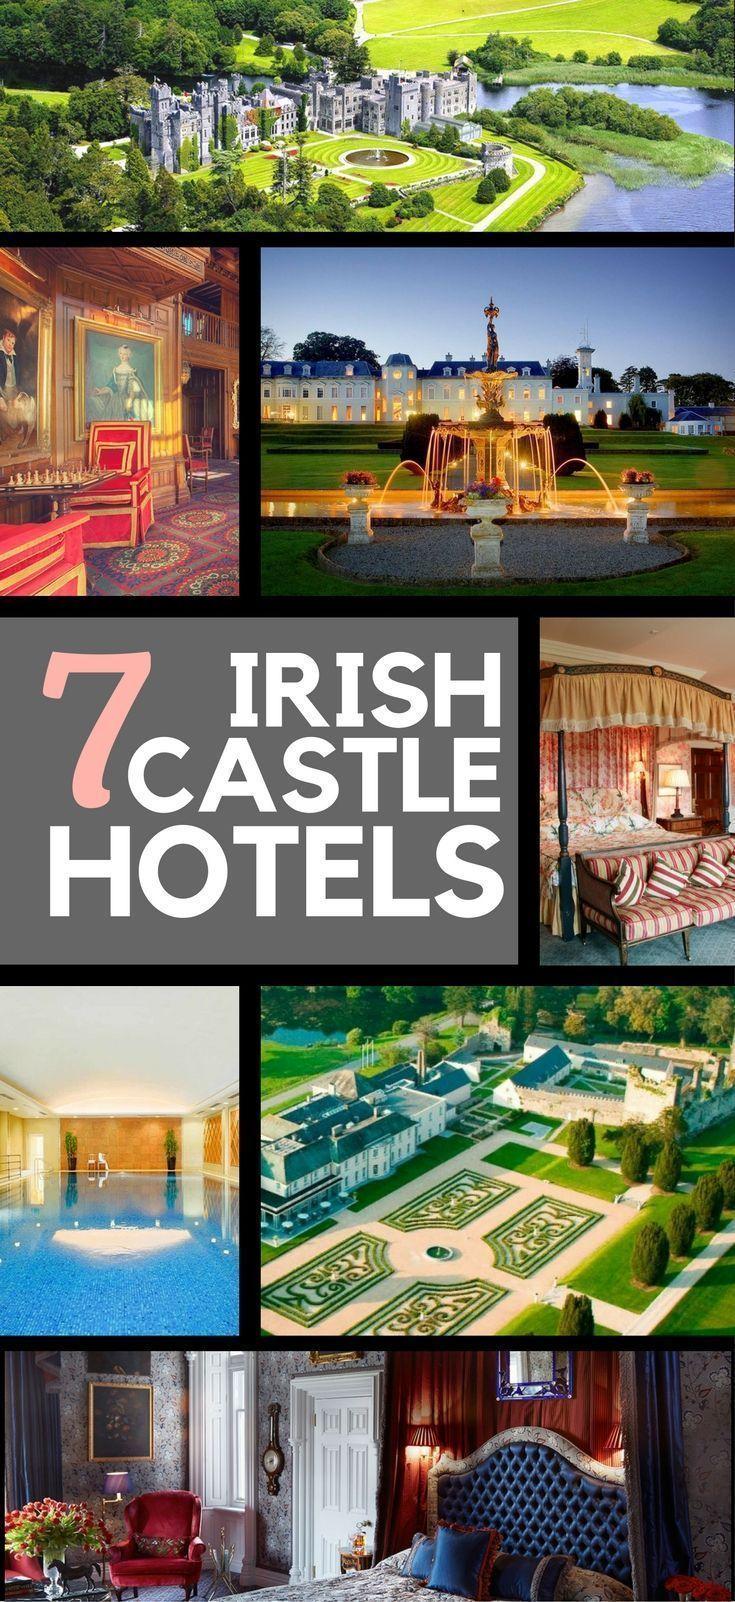 7 luxury castle hotels of Ireland will provide a fairy tale Ireland vacation.